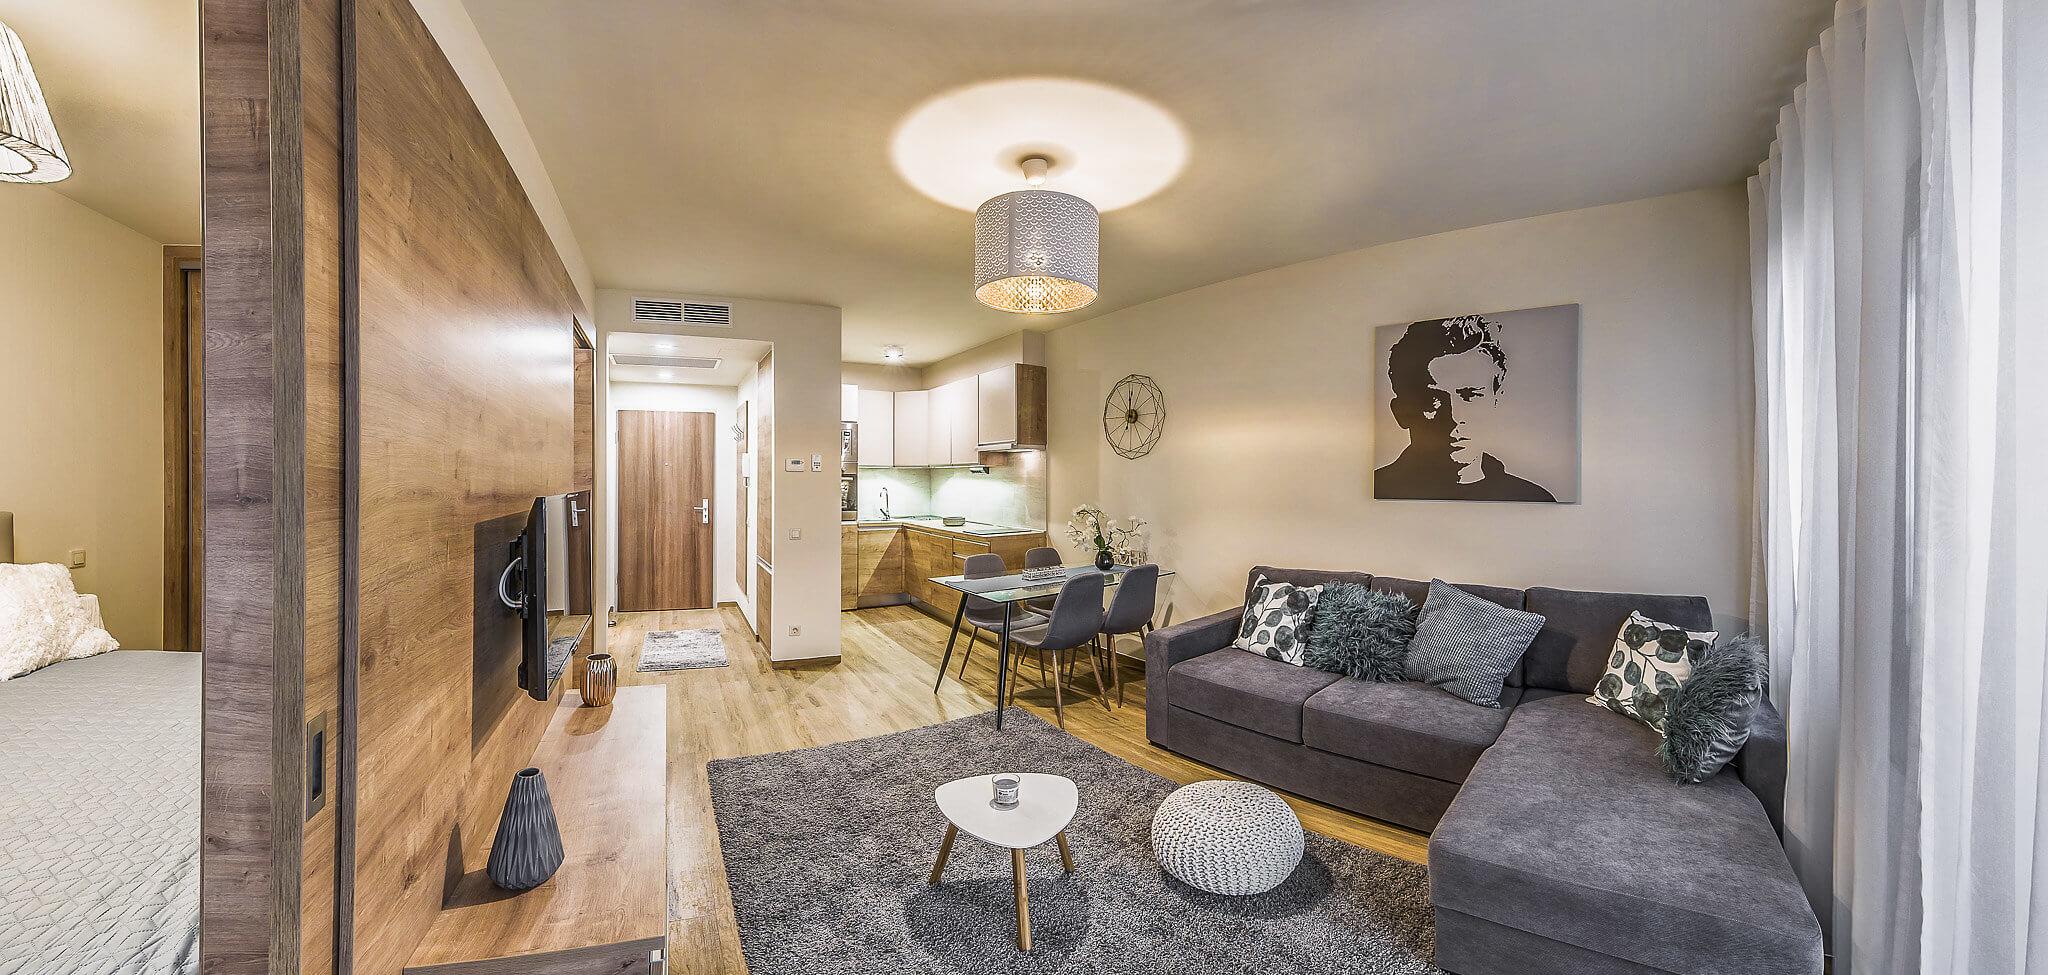 One bedroom Standard 3 - Art Homes Budapest